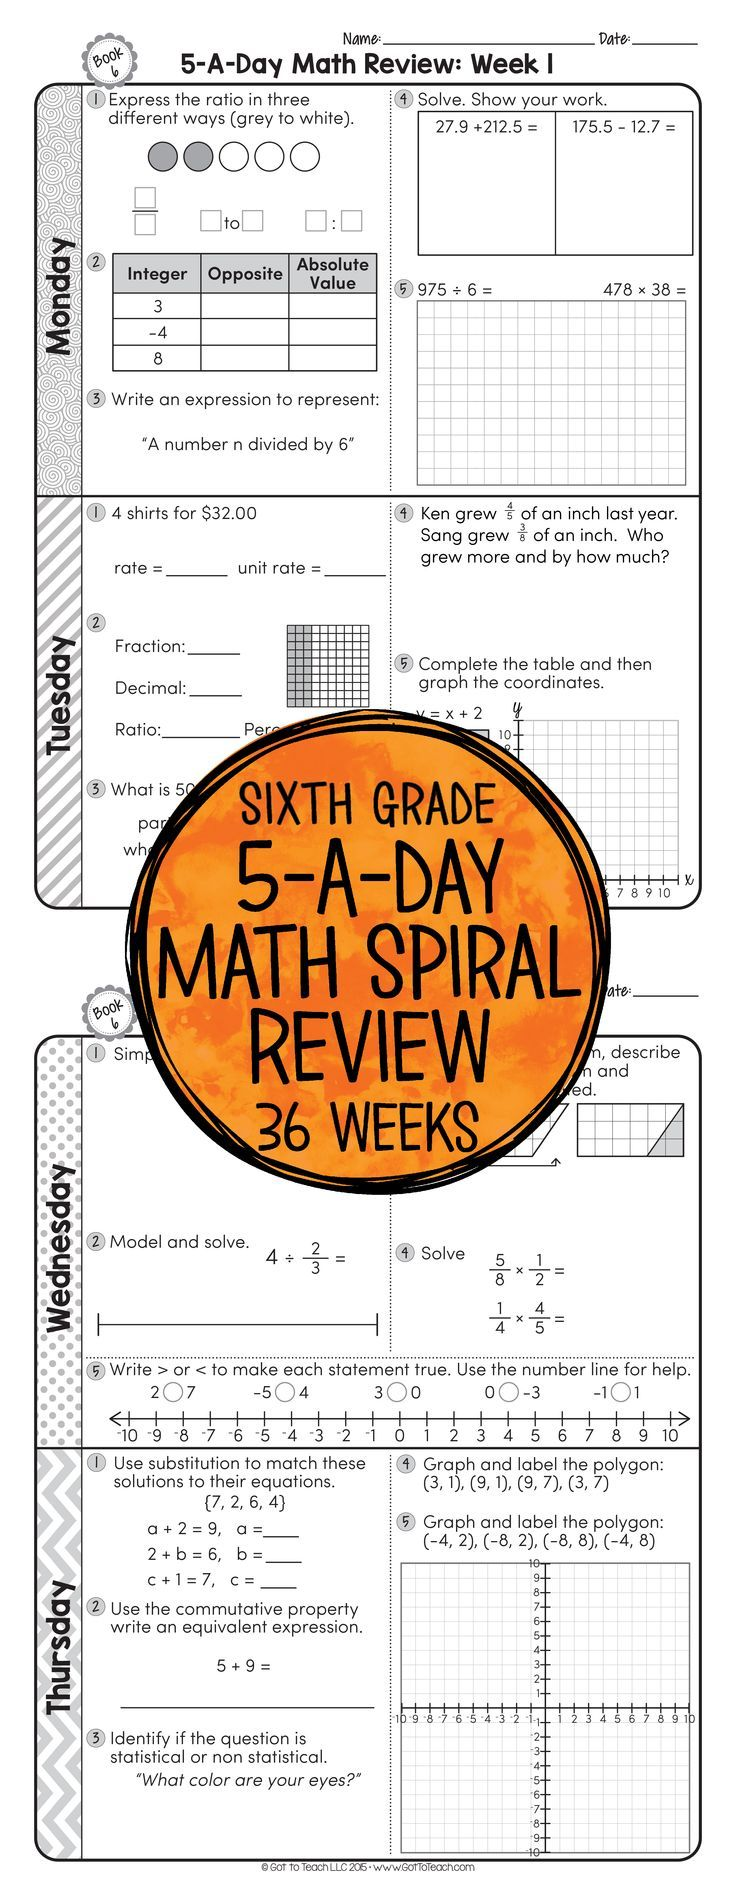 6th Grade Daily Math Spiral Review Daily Math Math Spiral Review Spiral Math [ 1904 x 736 Pixel ]